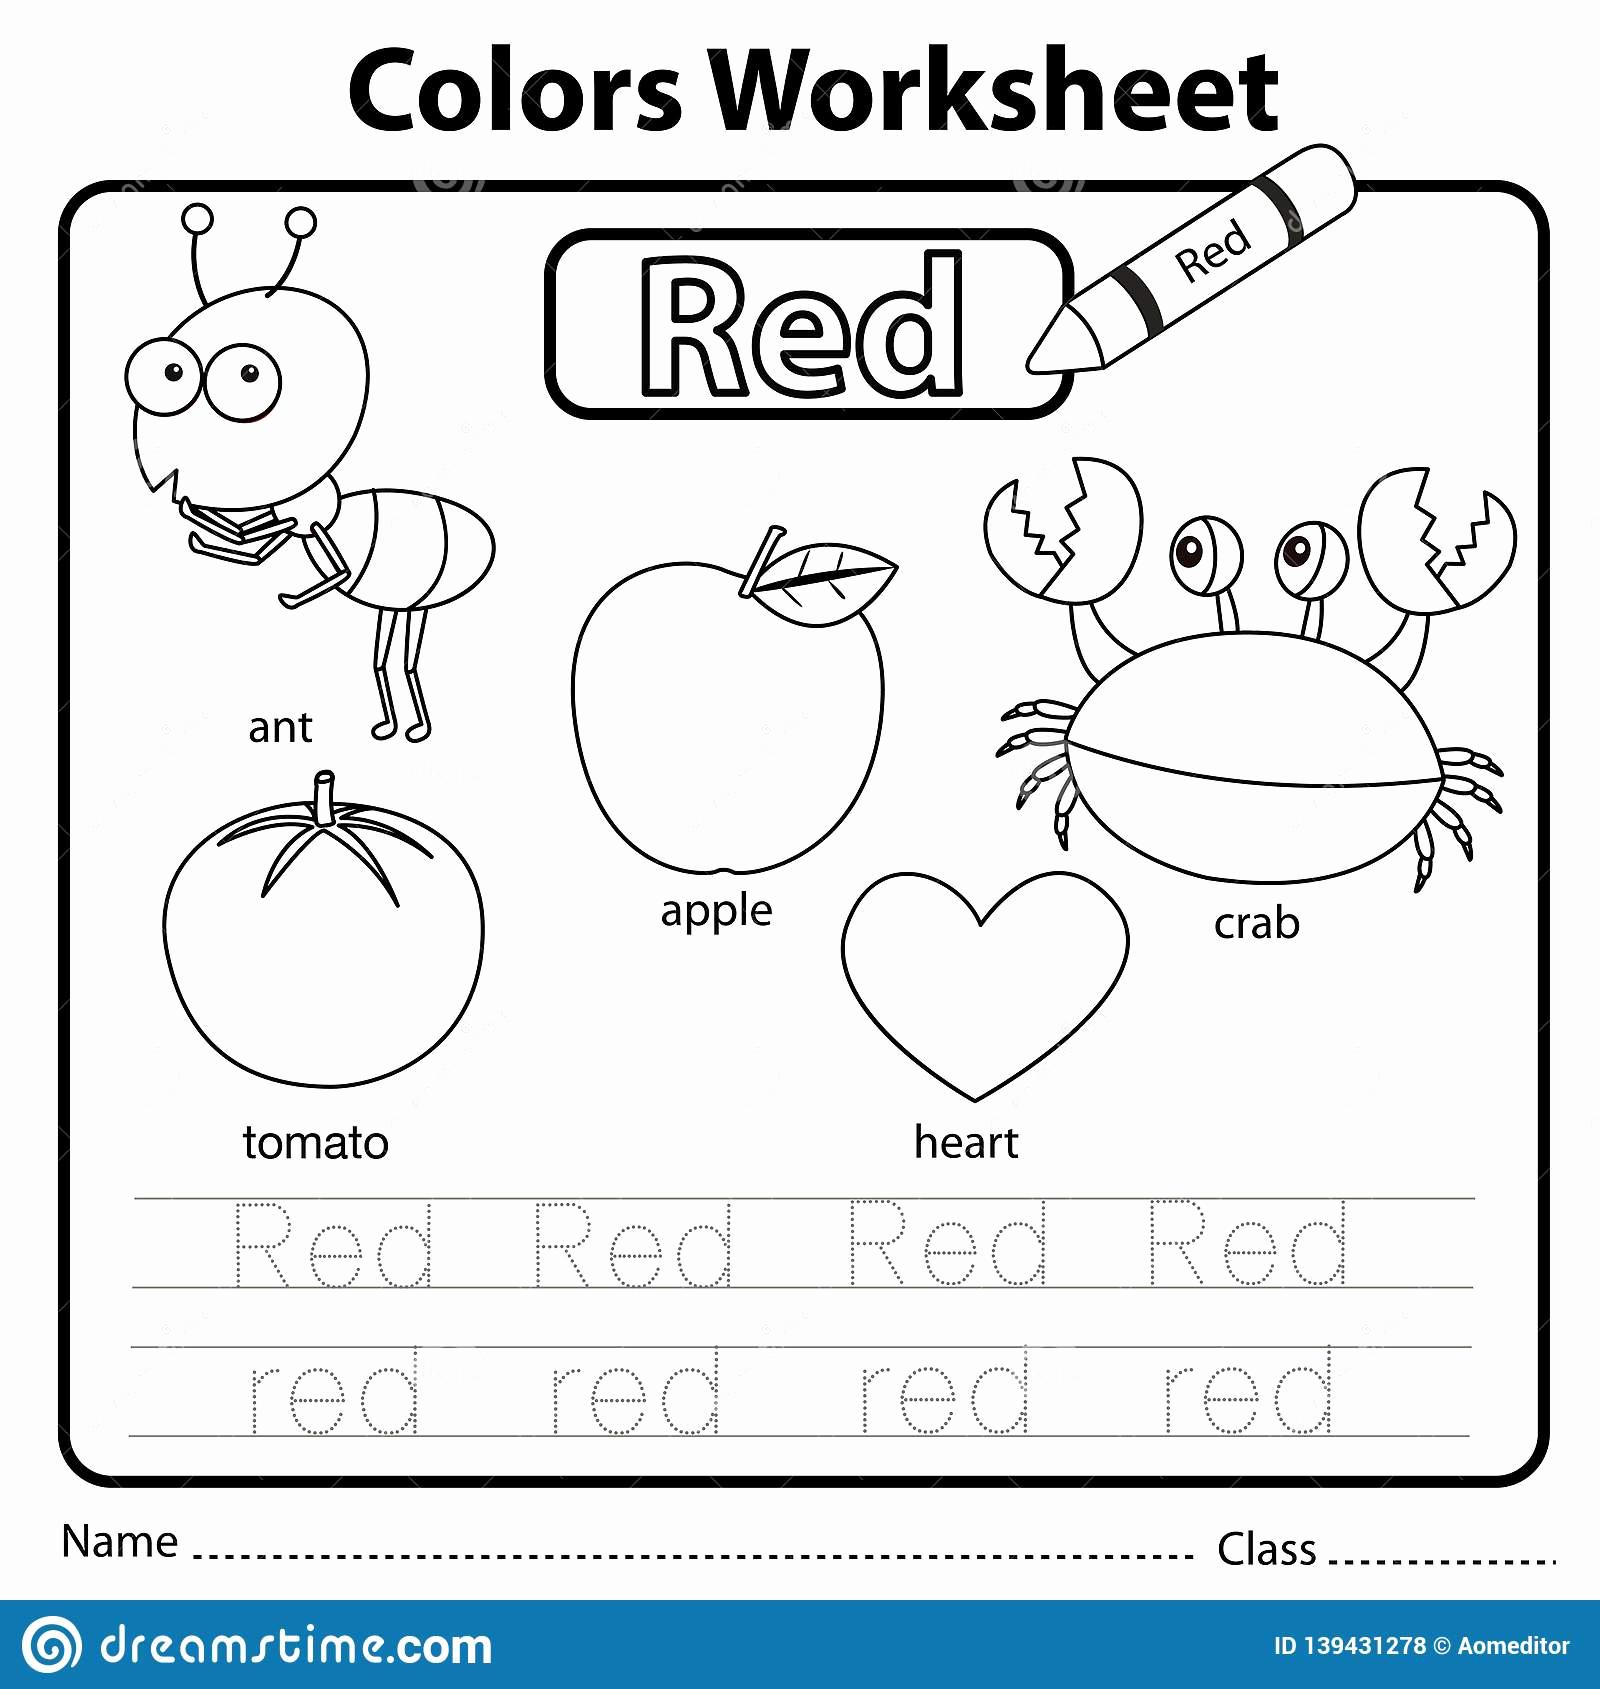 Color Red Worksheets for toddlers Lovely Illustrator Color Worksheet Red Stock Vector